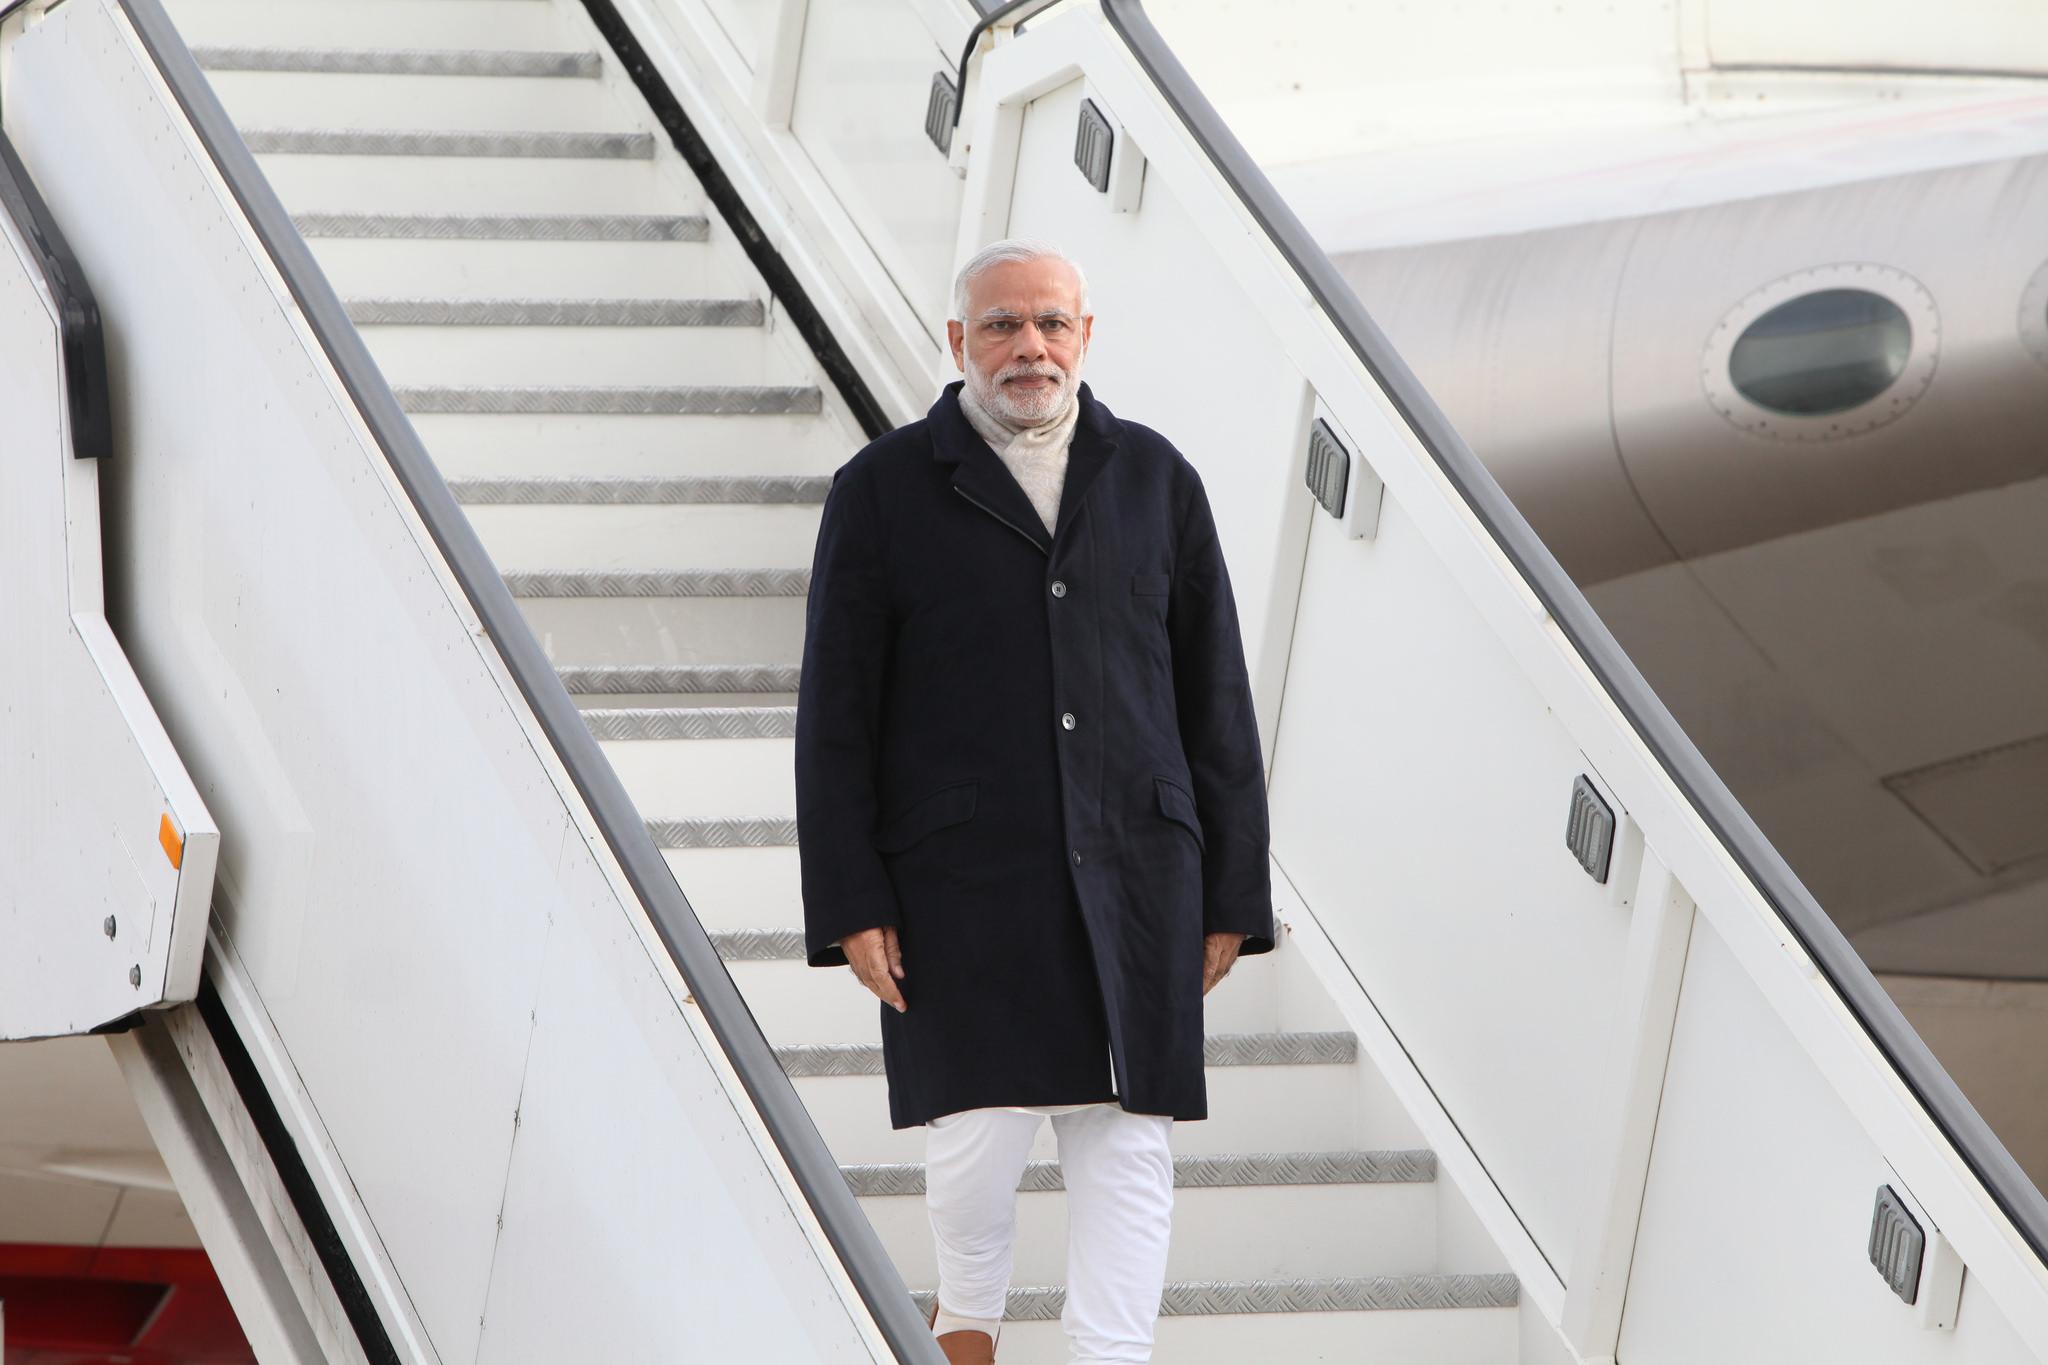 can eu india summit revive flagging partnership